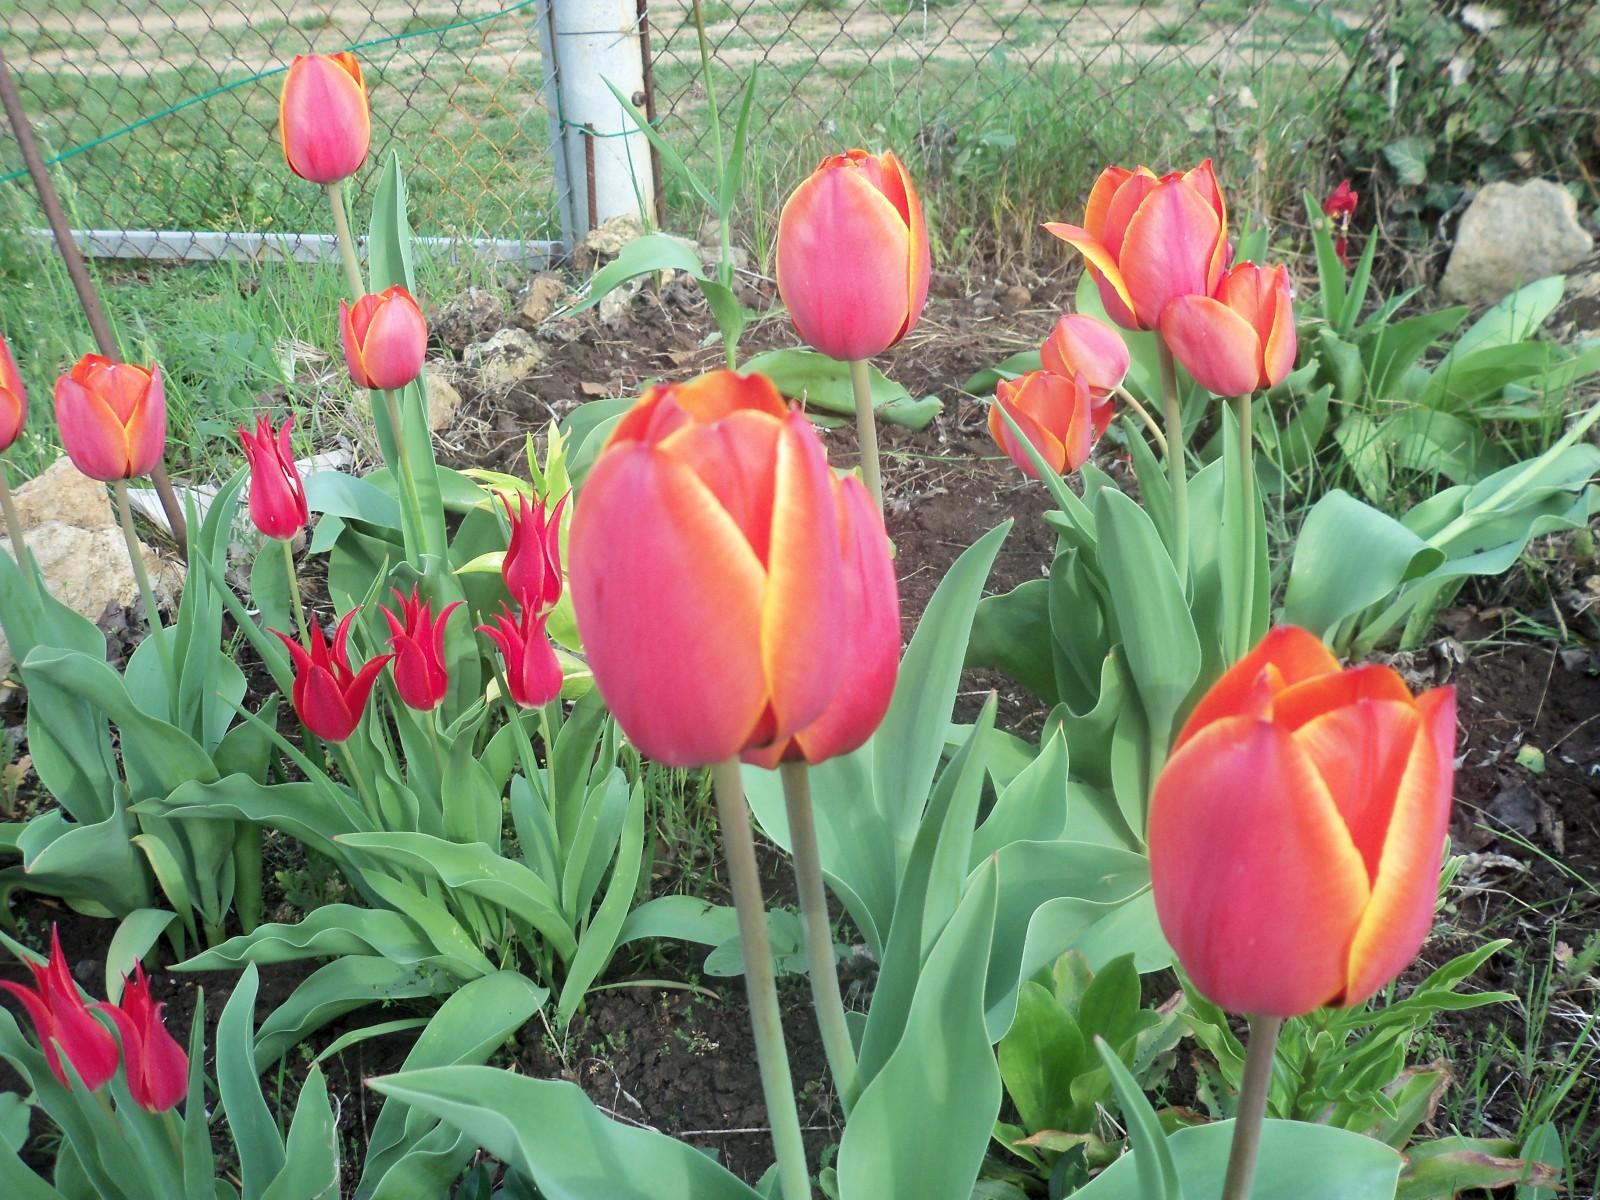 Садовые товарищи - Страница 4 2n894ht